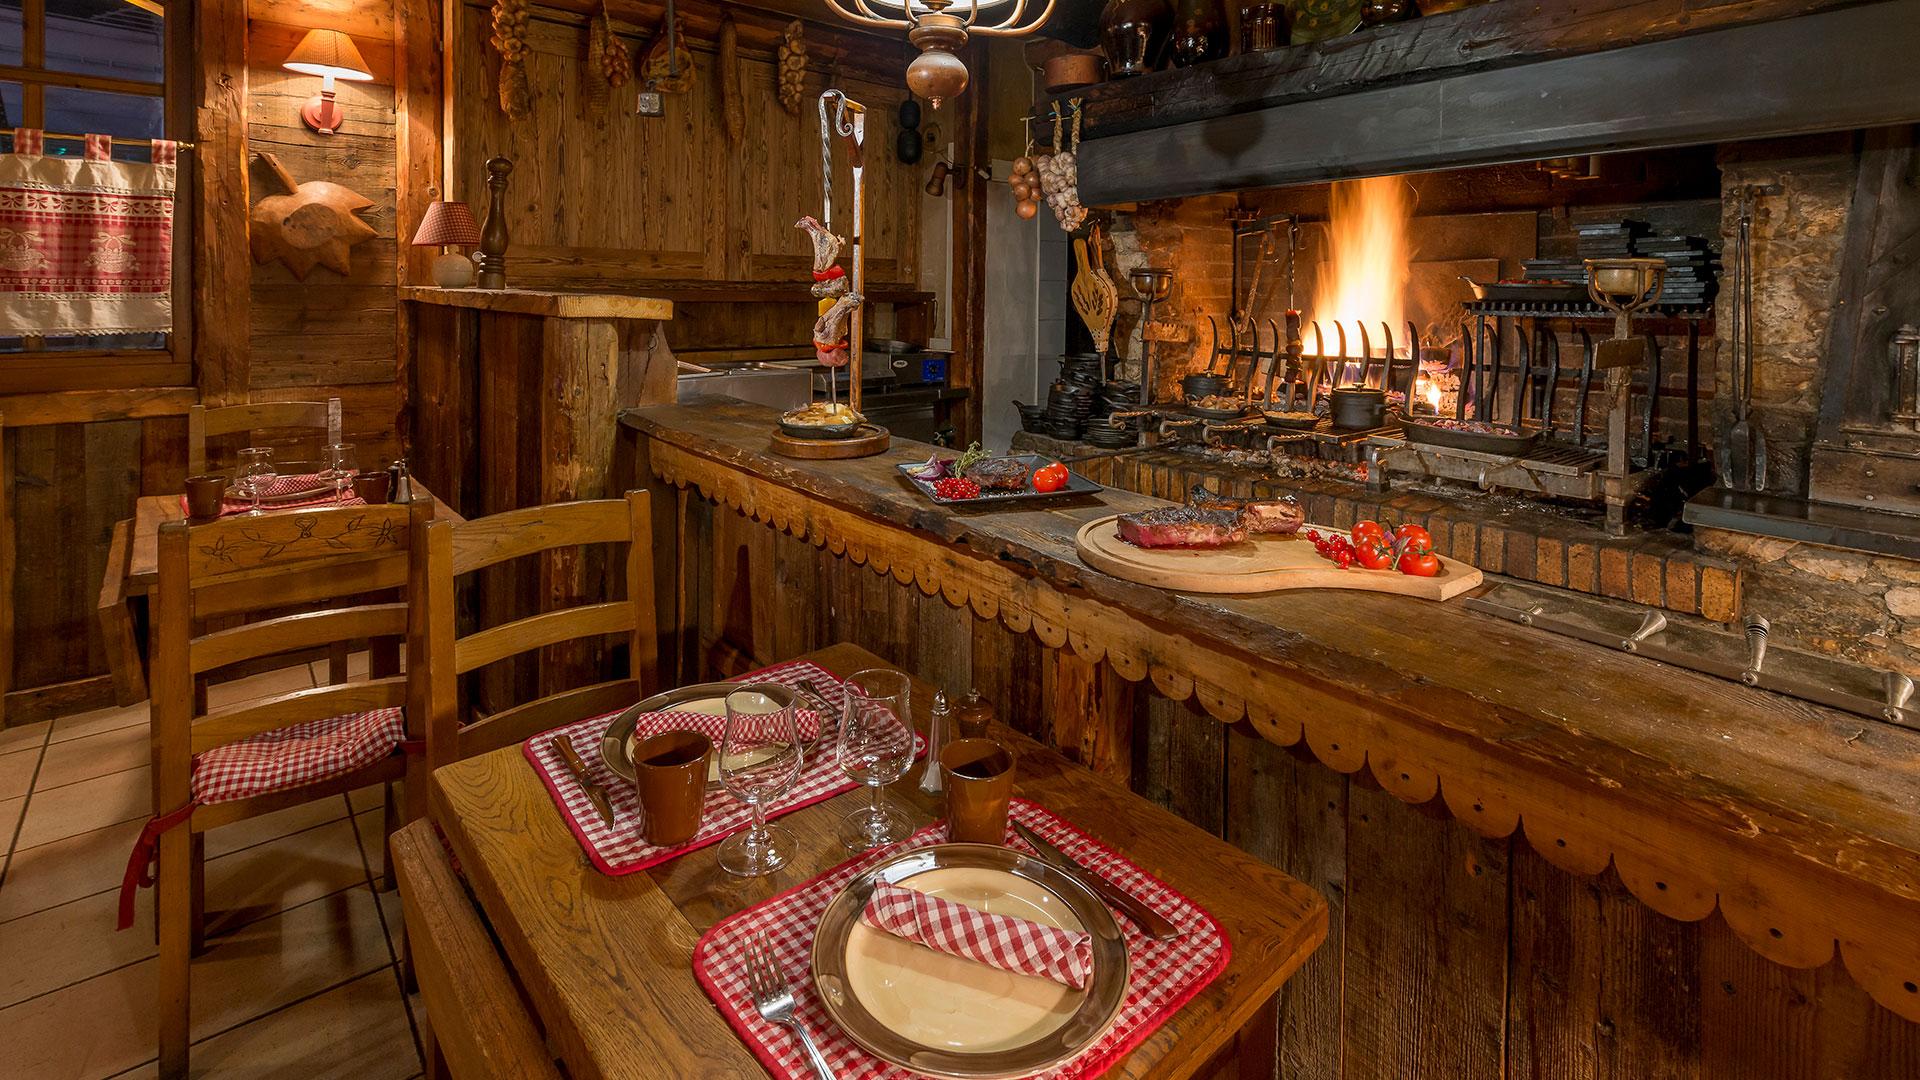 Restaurant savoyard dans les Alpes